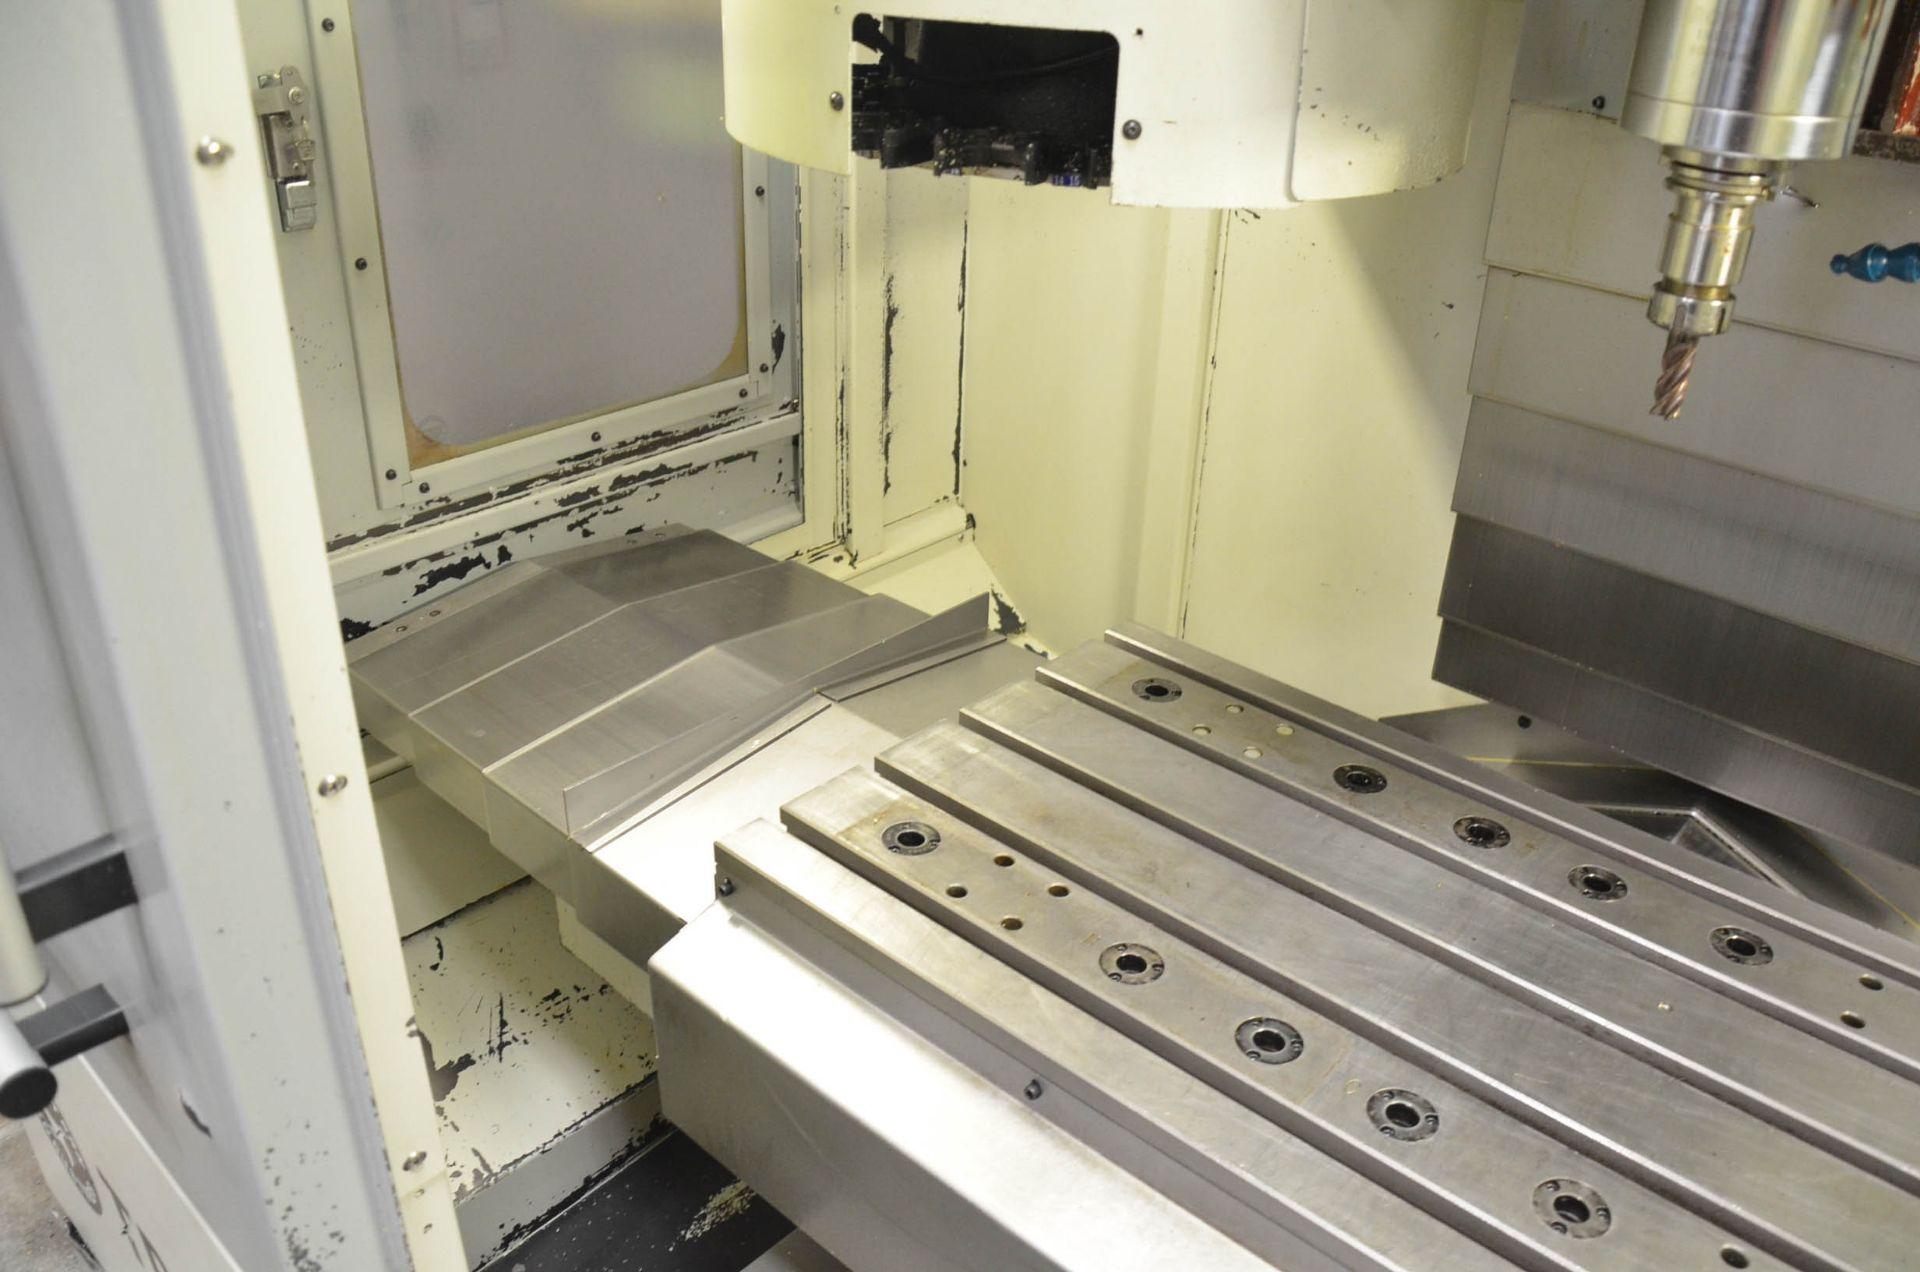 "SWI (2013) TRAK LPM CNC VERTICAL MACHINING CENTER WITH PROTO TRAK PMX CNC CONTROL, 19.5"" X 35.5"" - Image 7 of 9"